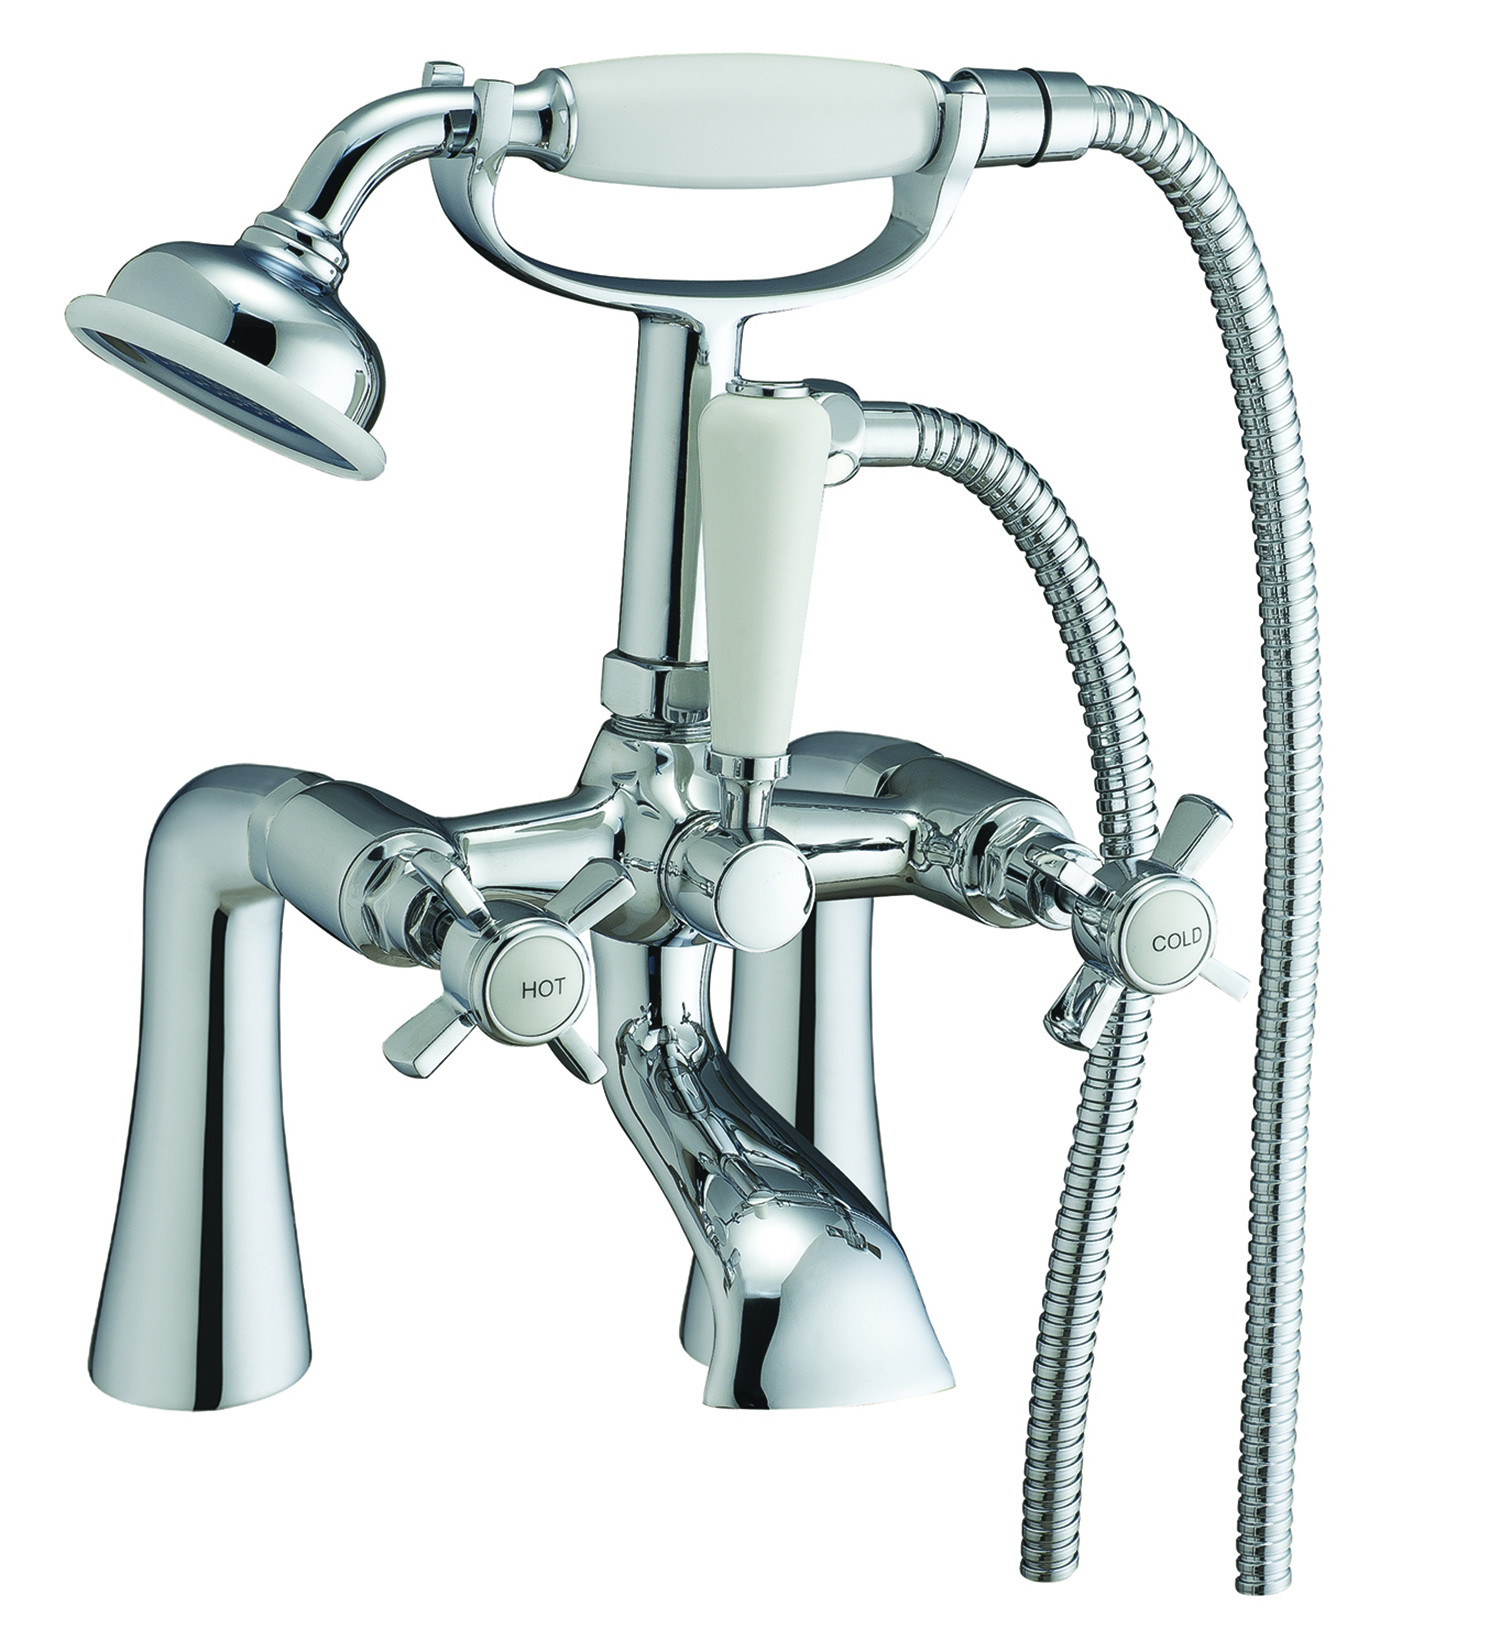 Victorian Bath Shower Mixer   FrontlineBathrooms.com